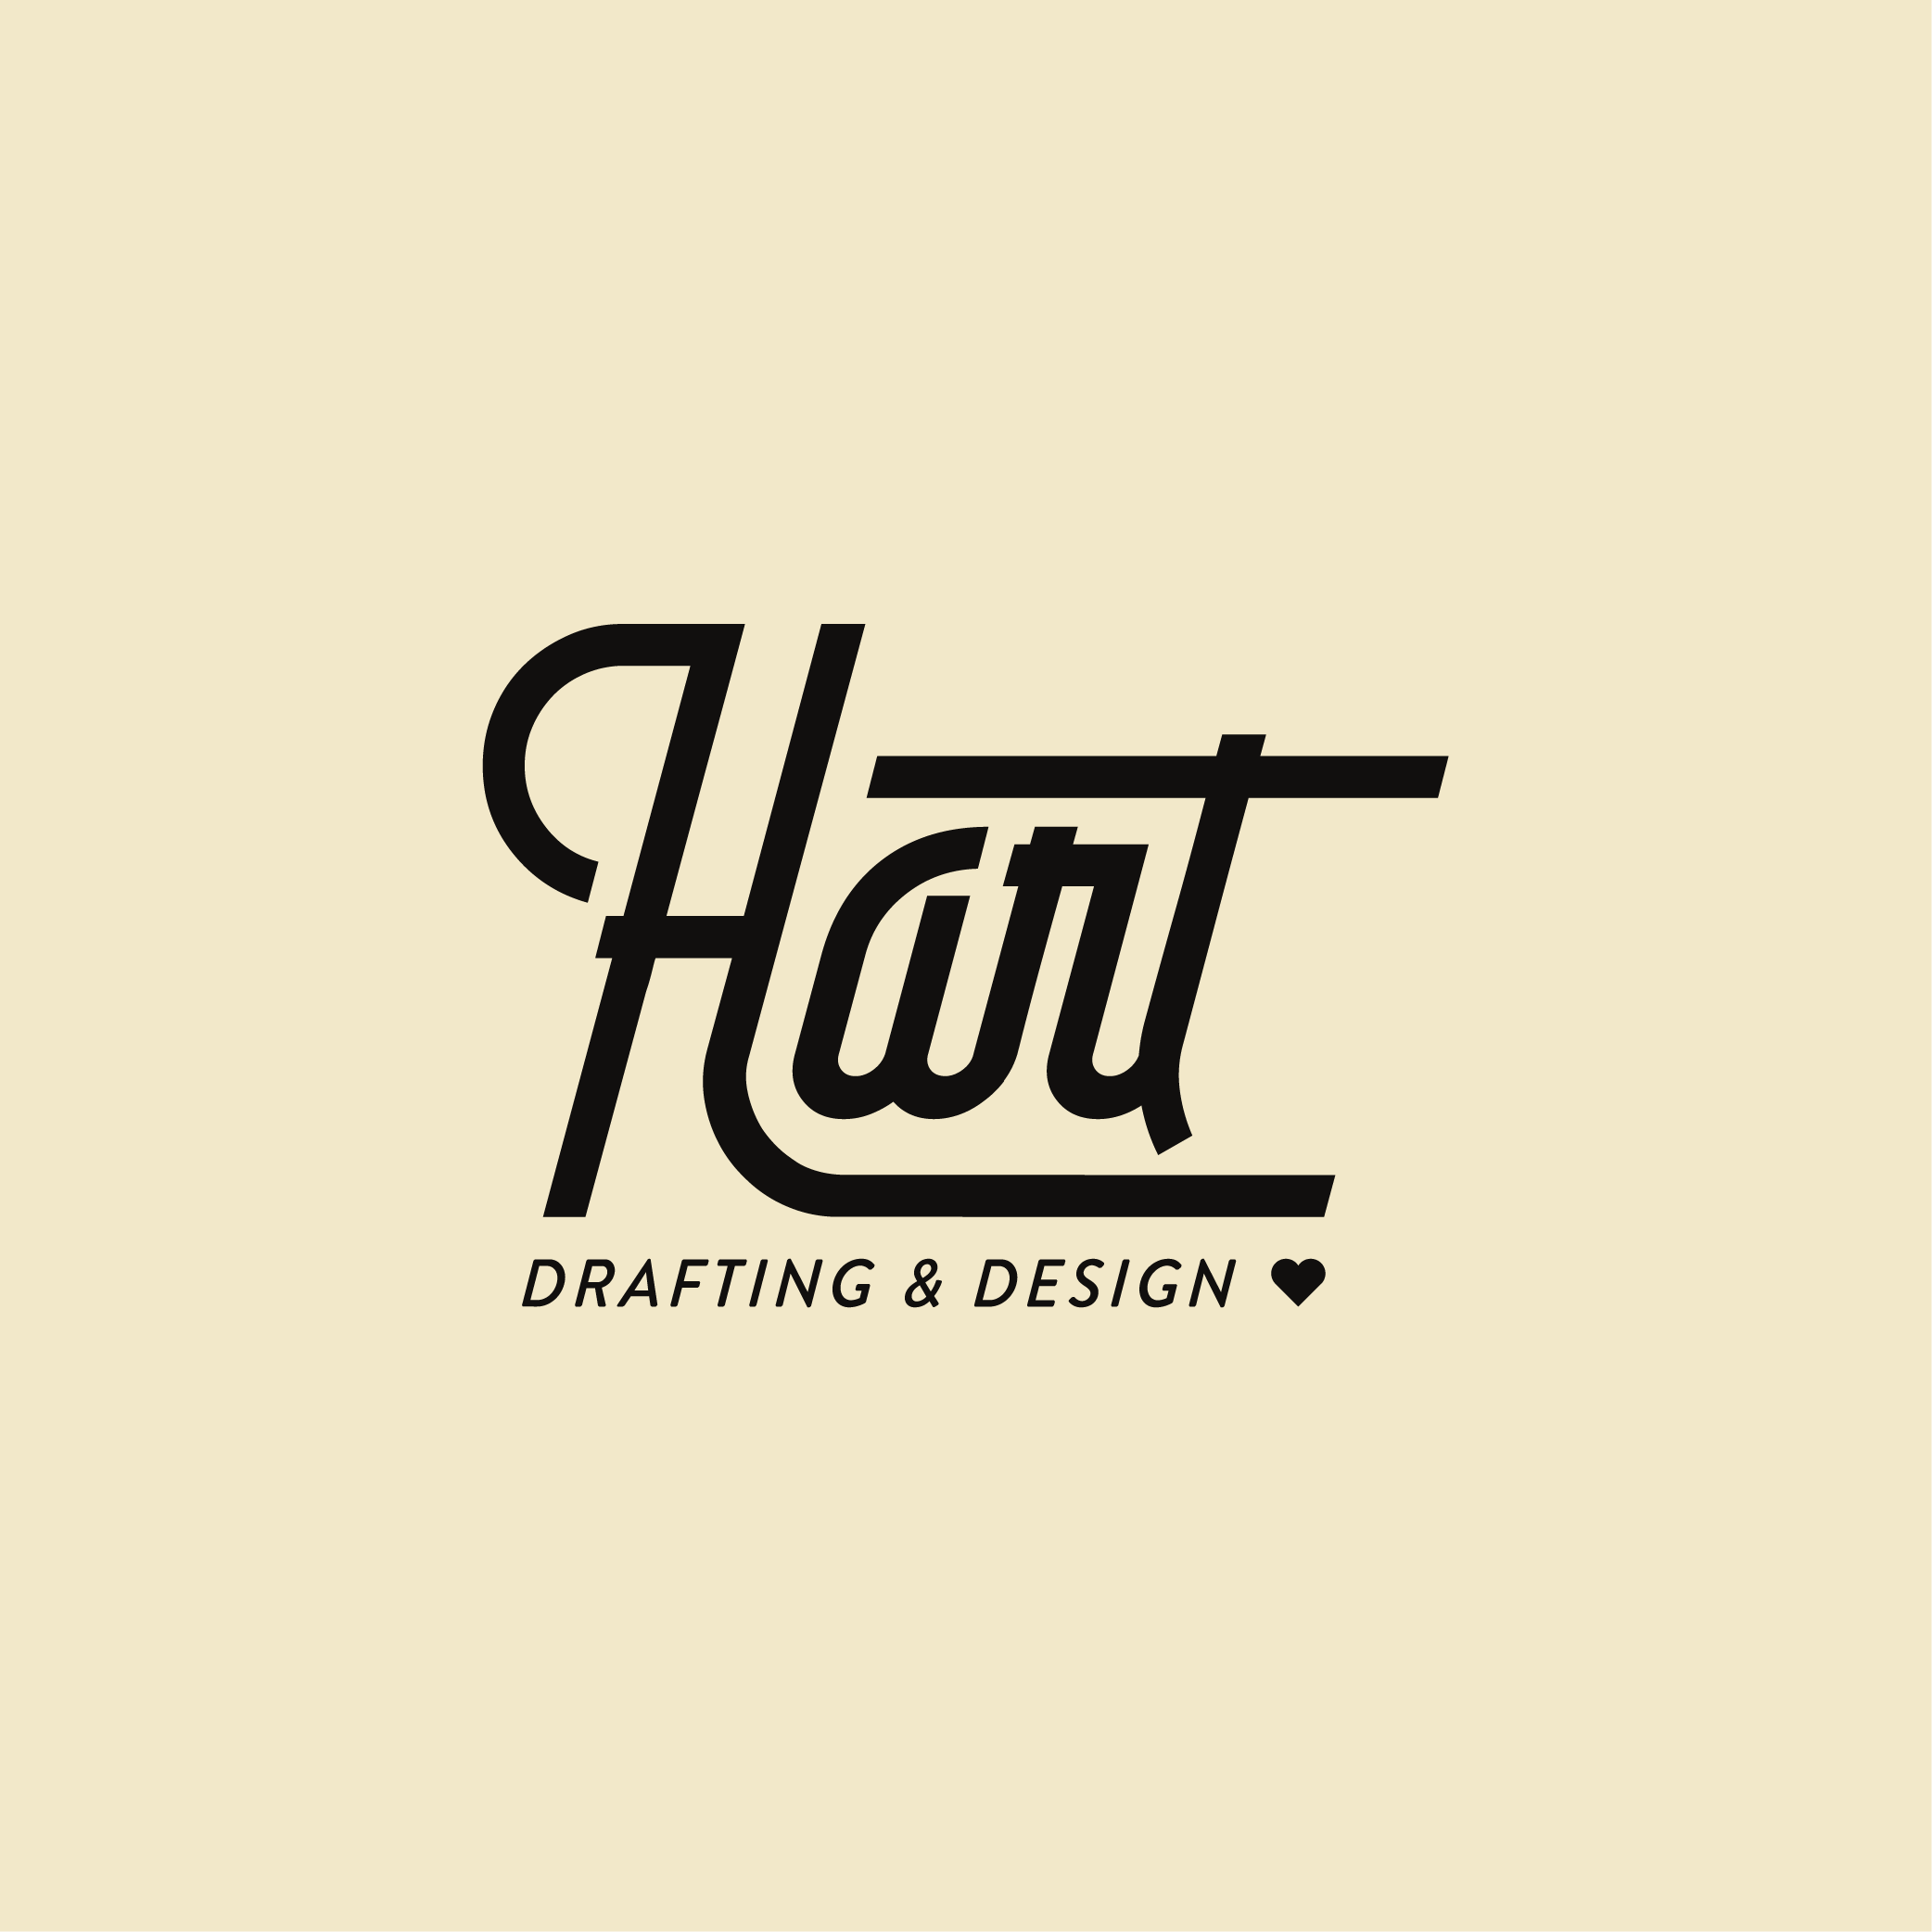 Create an urban artistic logo for a young ambitious designer!